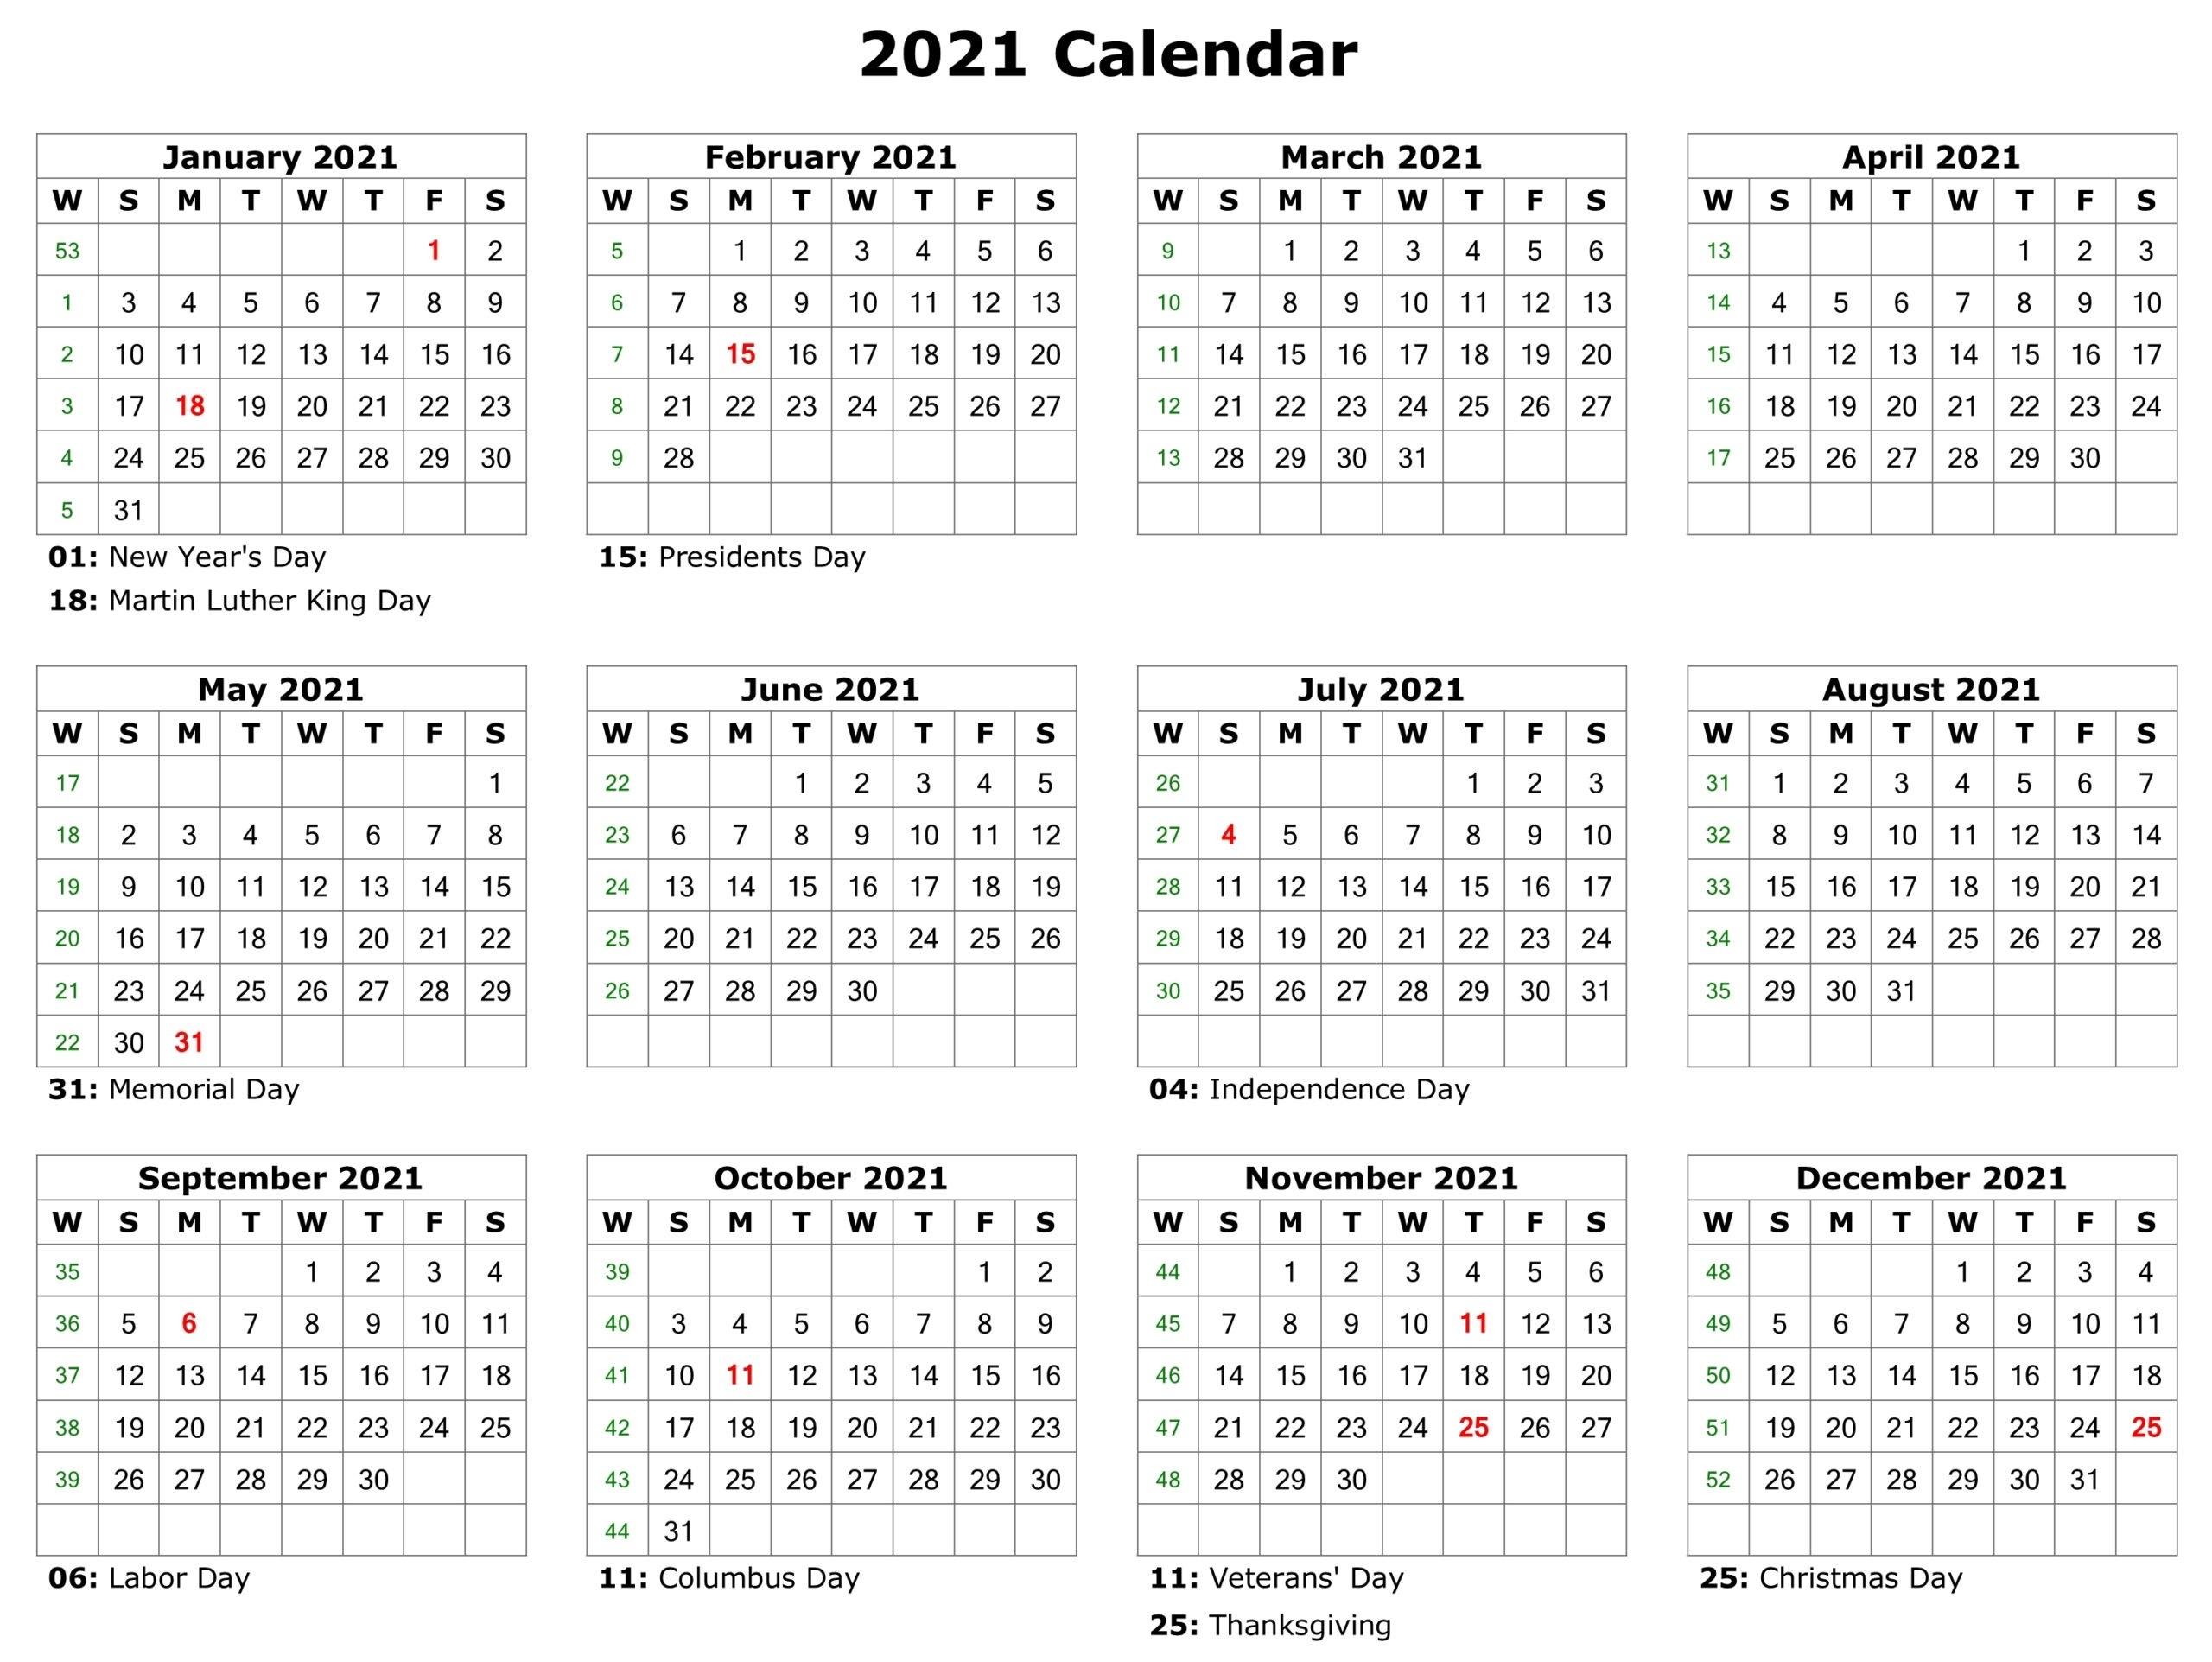 Philippines 2021 Calendar Printable Pdf   2021 Printable Calendars in Philippine Calendar 2021 With Holidays